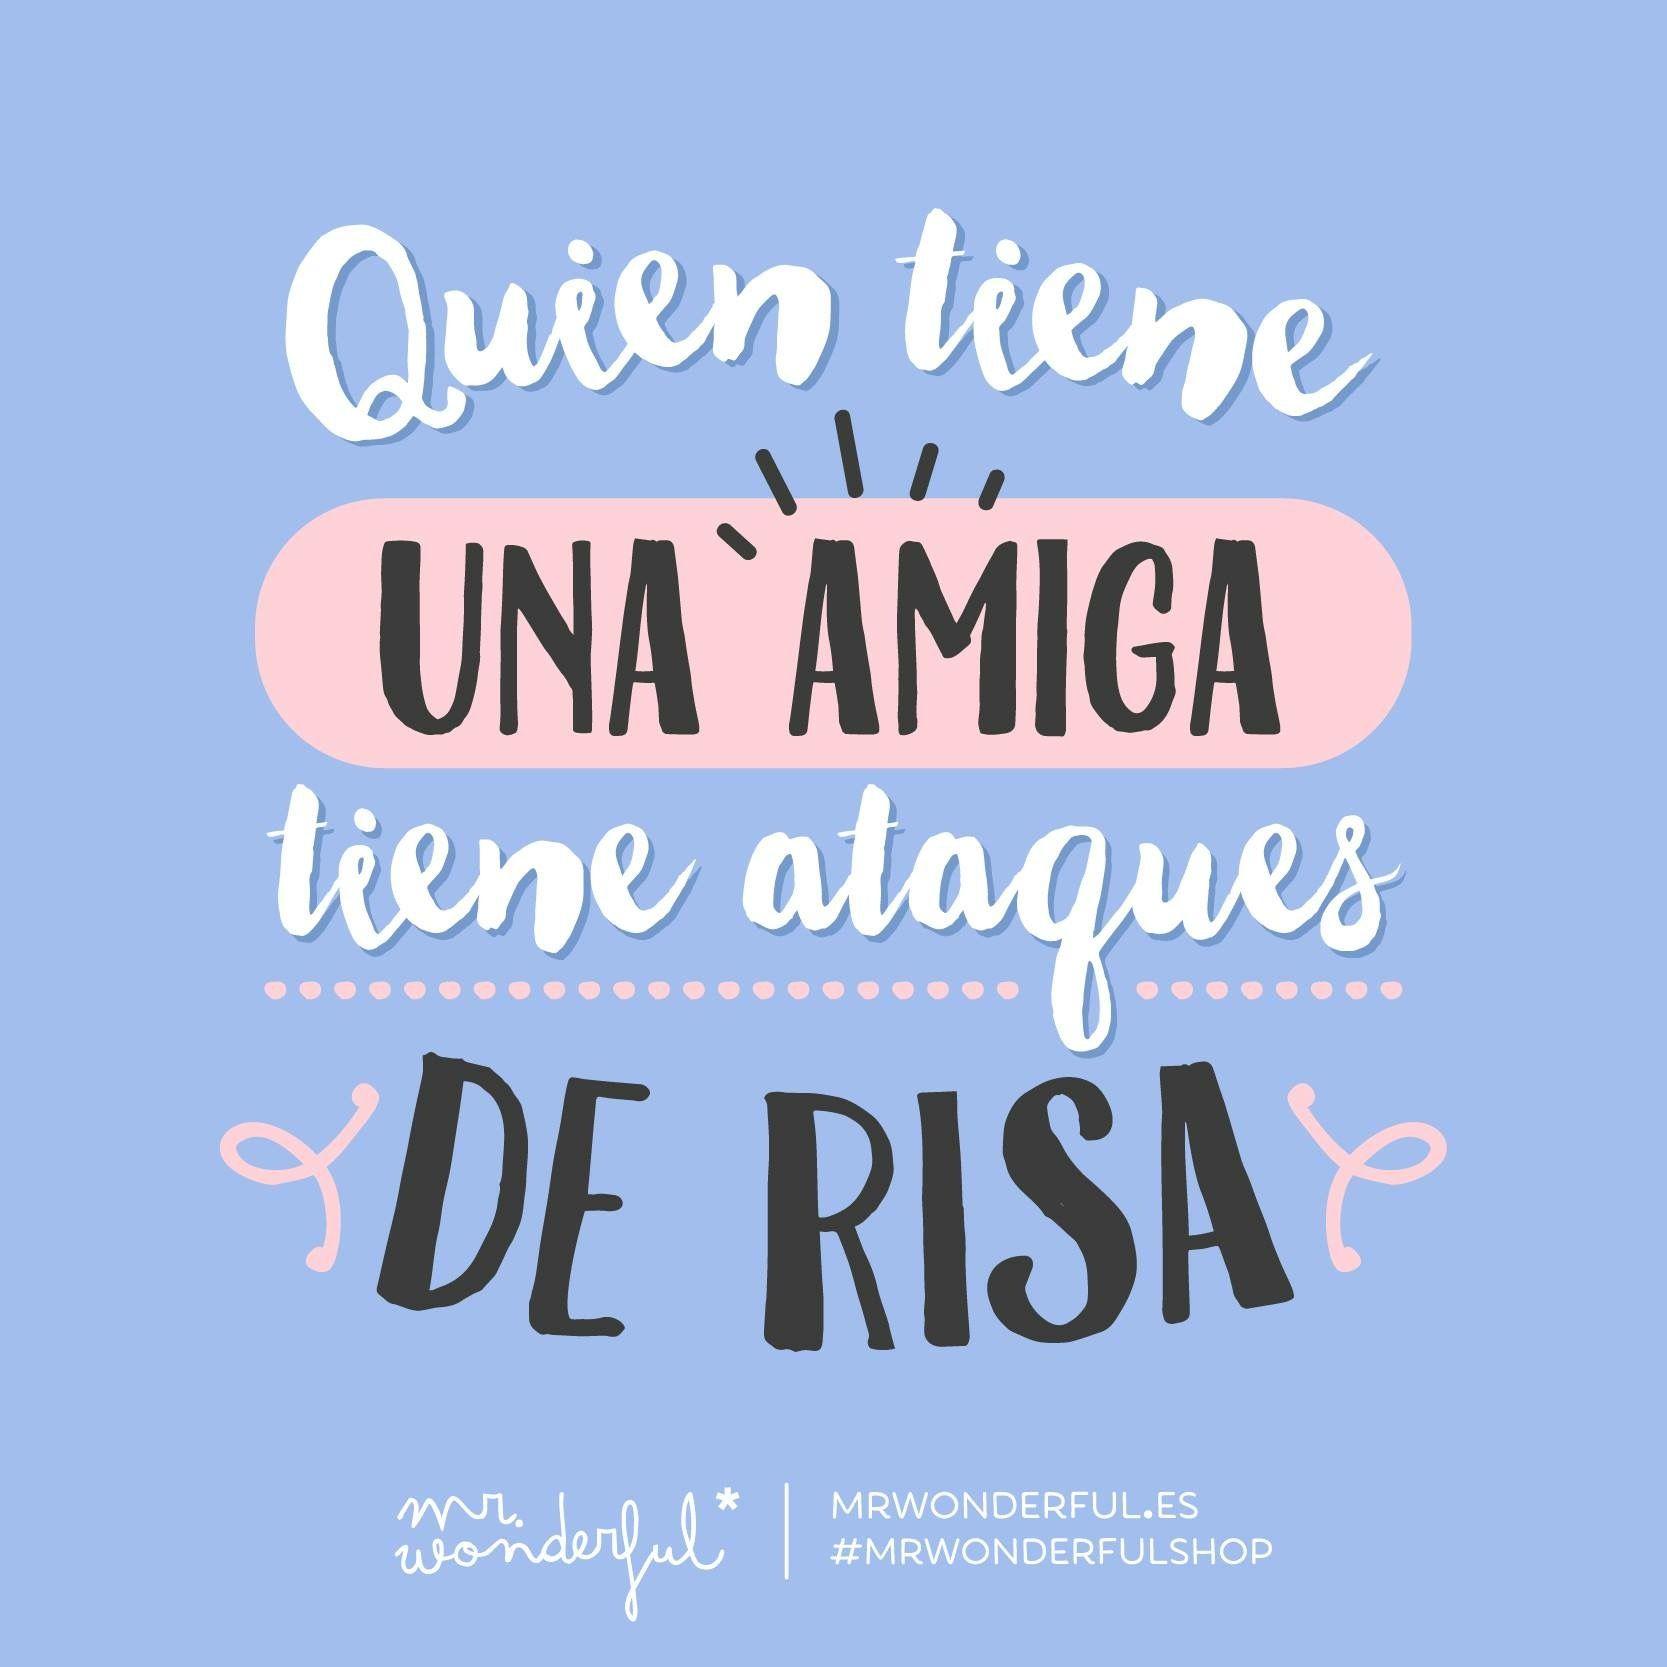 Quotes About Friendship In Spanish Pinana Belen Peidro On Frases Bonitas   Pinterest